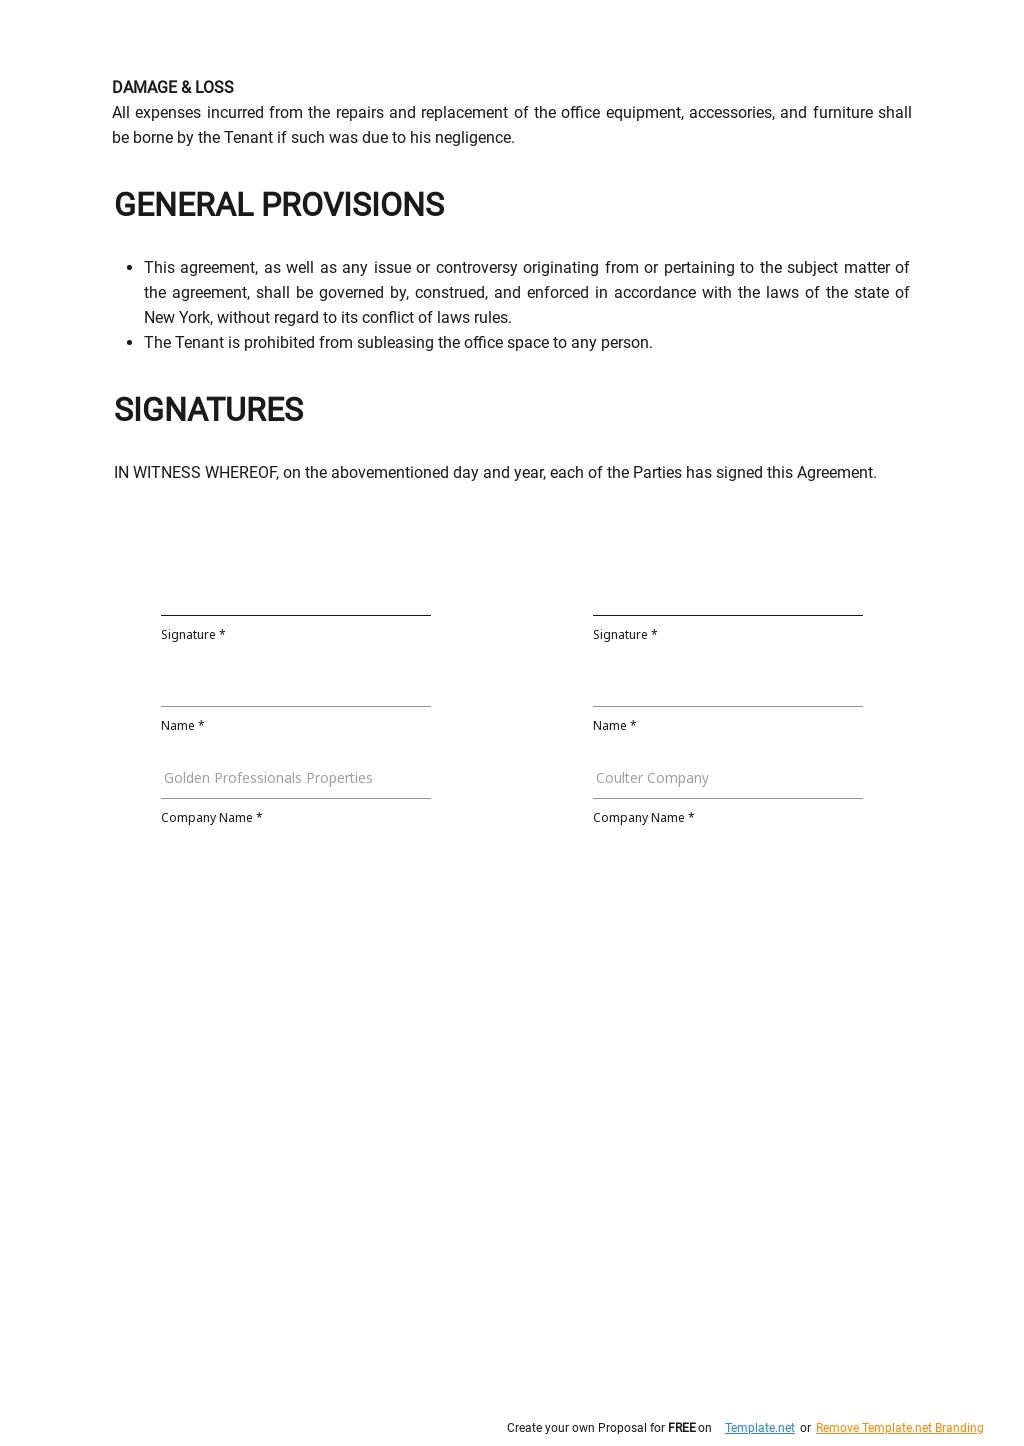 Free Office Rental Agreement Template  2.jpe